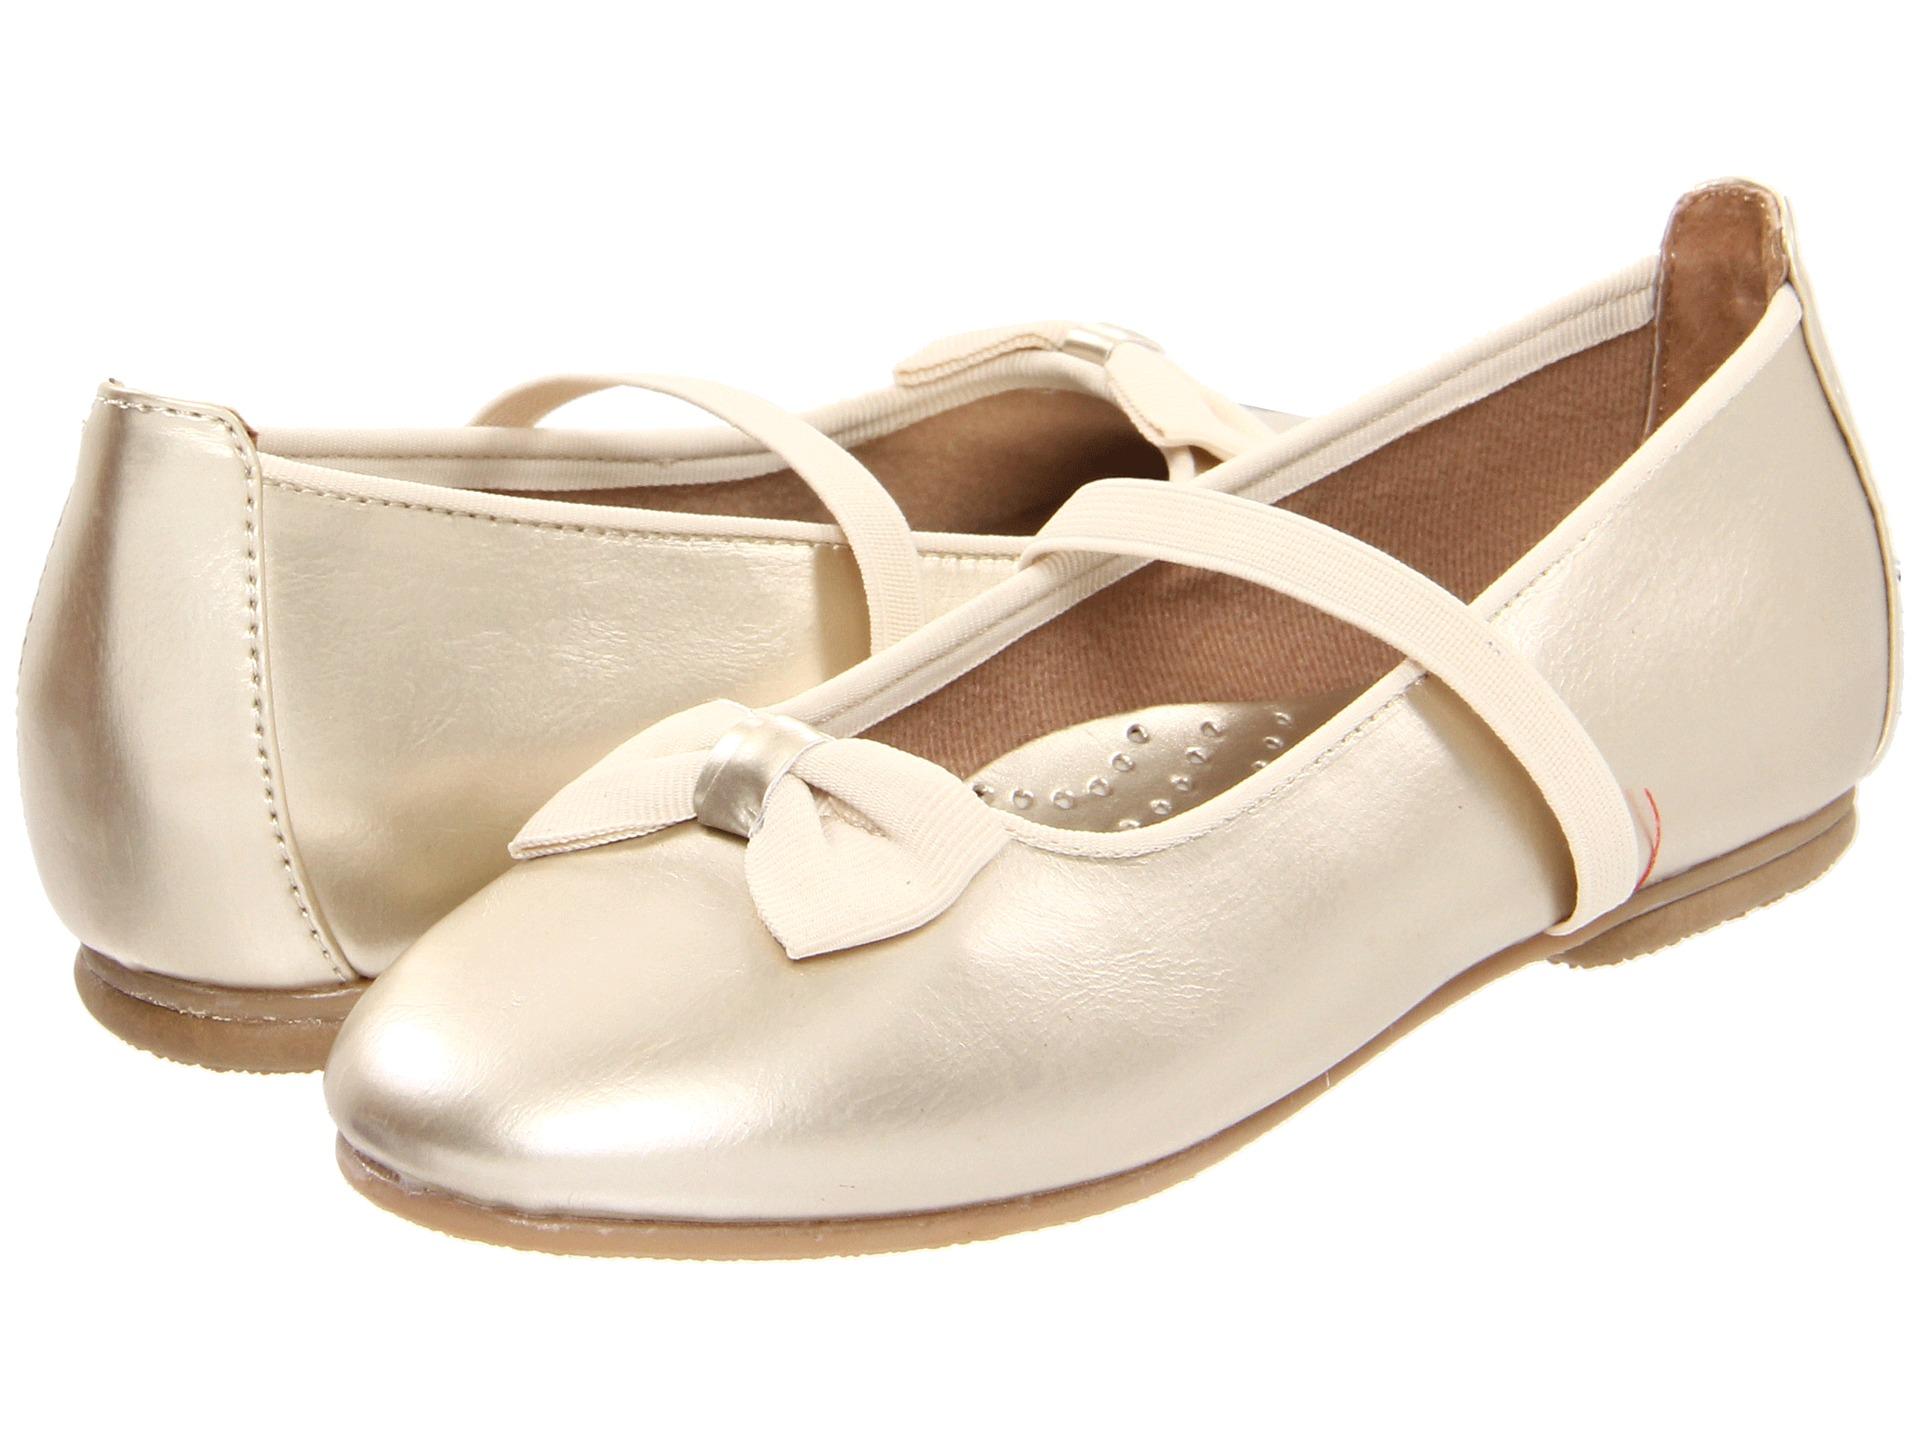 Jumping Jacks Belleto Shoes Reviews